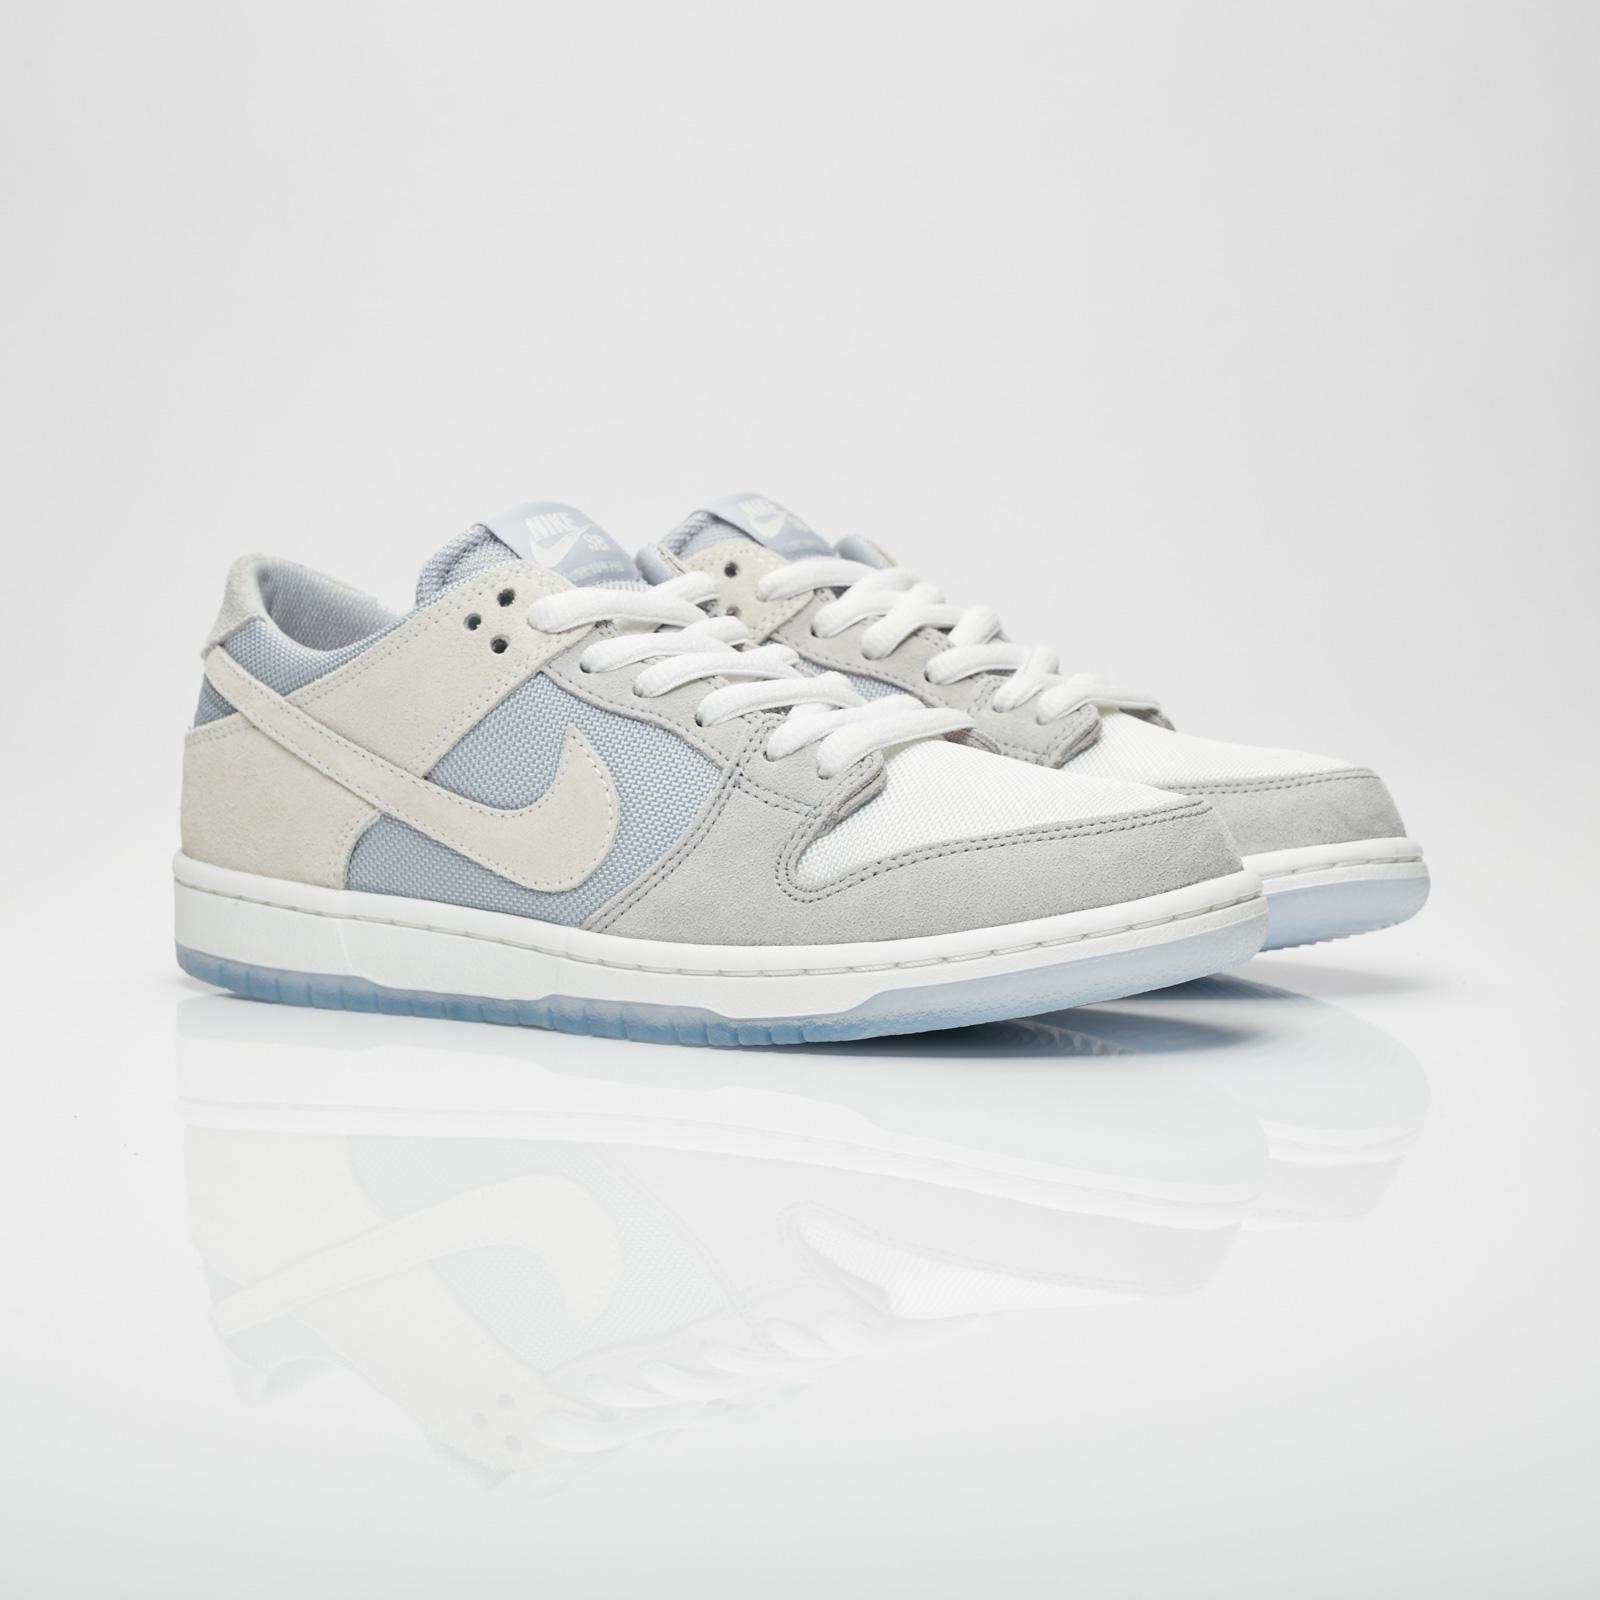 62398c245fc8a3 Nike Zoom Dunk Low Pro - 854866-011 - Sneakersnstuff